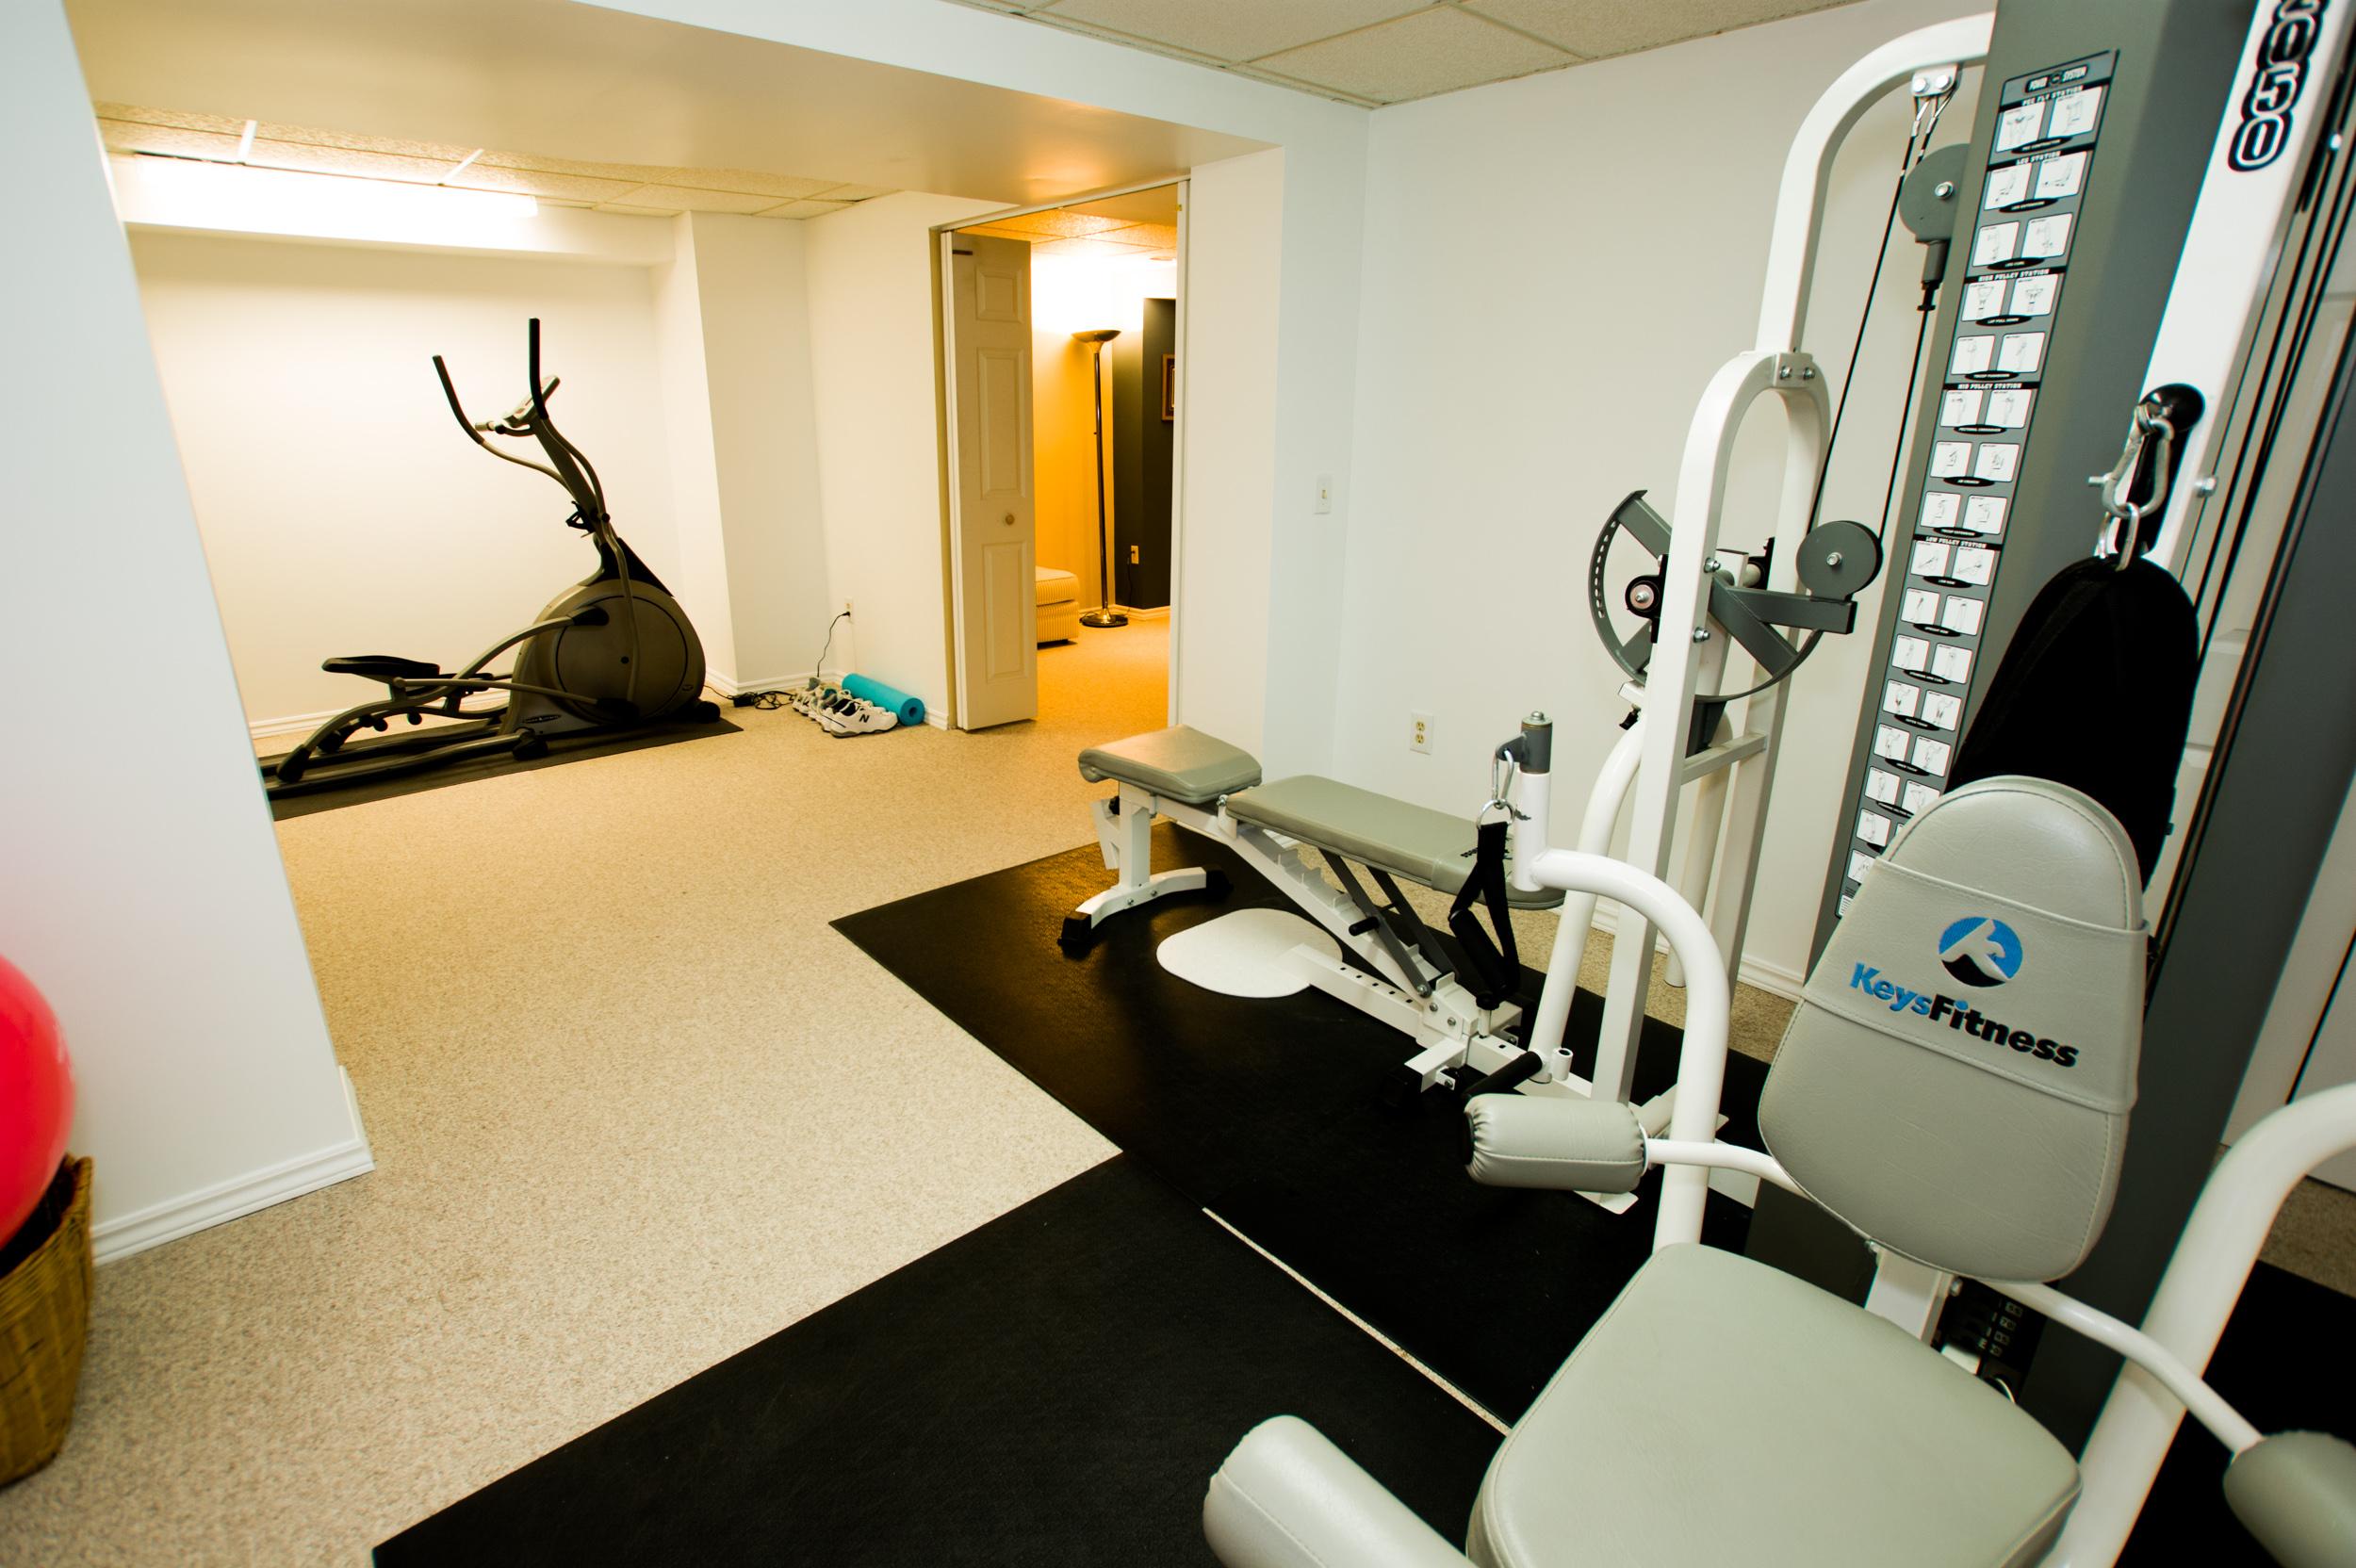 20-Liebeck-26 Exercise Room.jpg